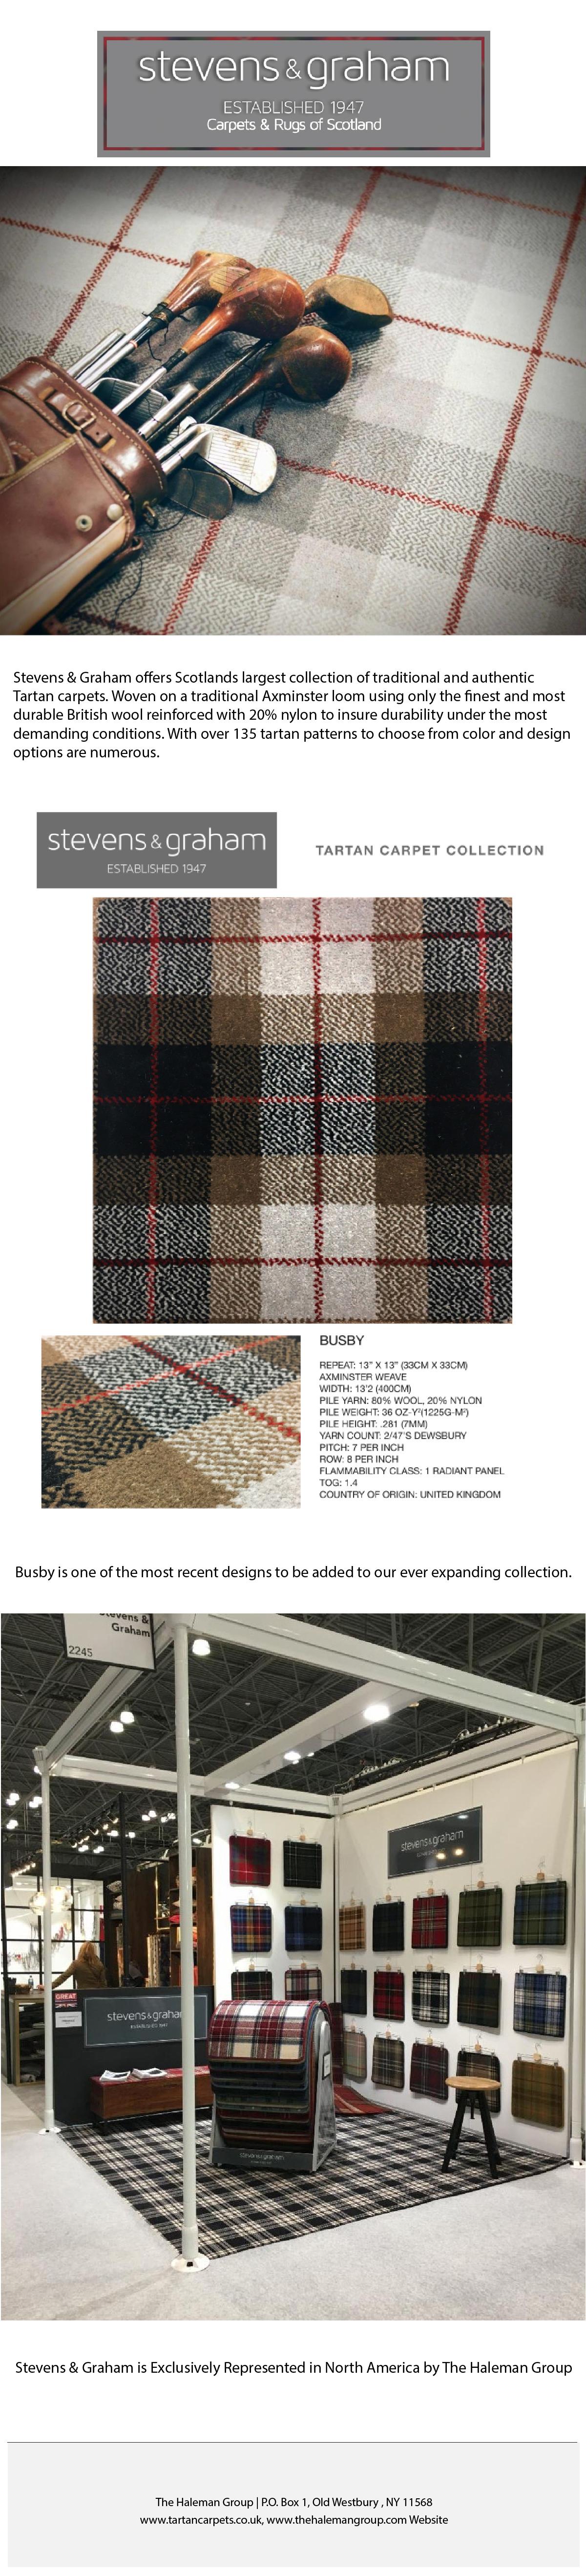 Tartan carpet and rug image